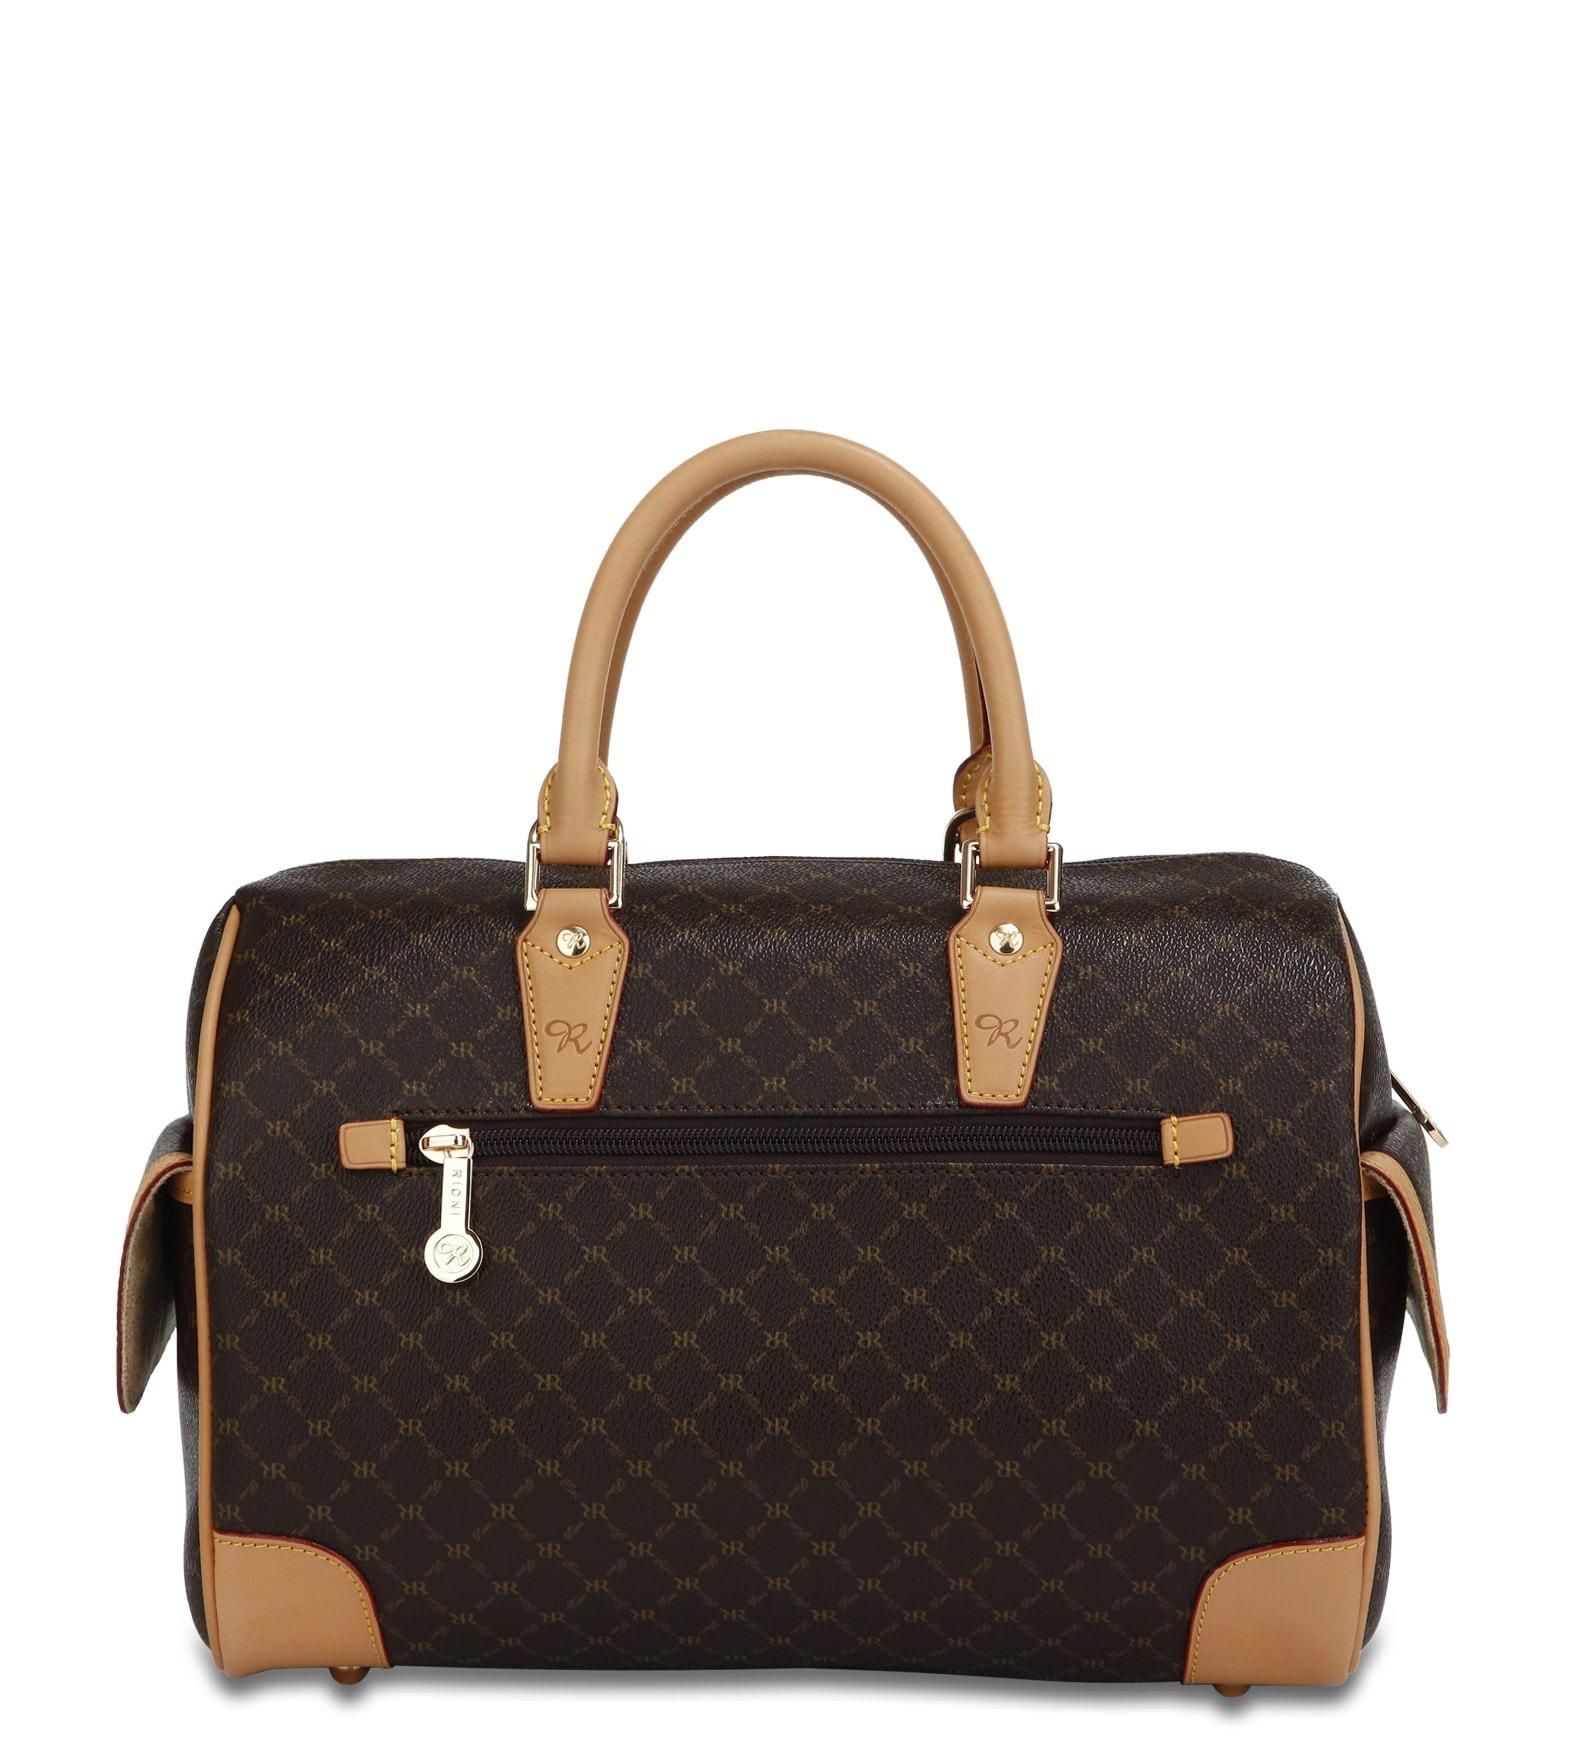 Rioni Signature Large Boston Handbag Free Shipping Today 3255099